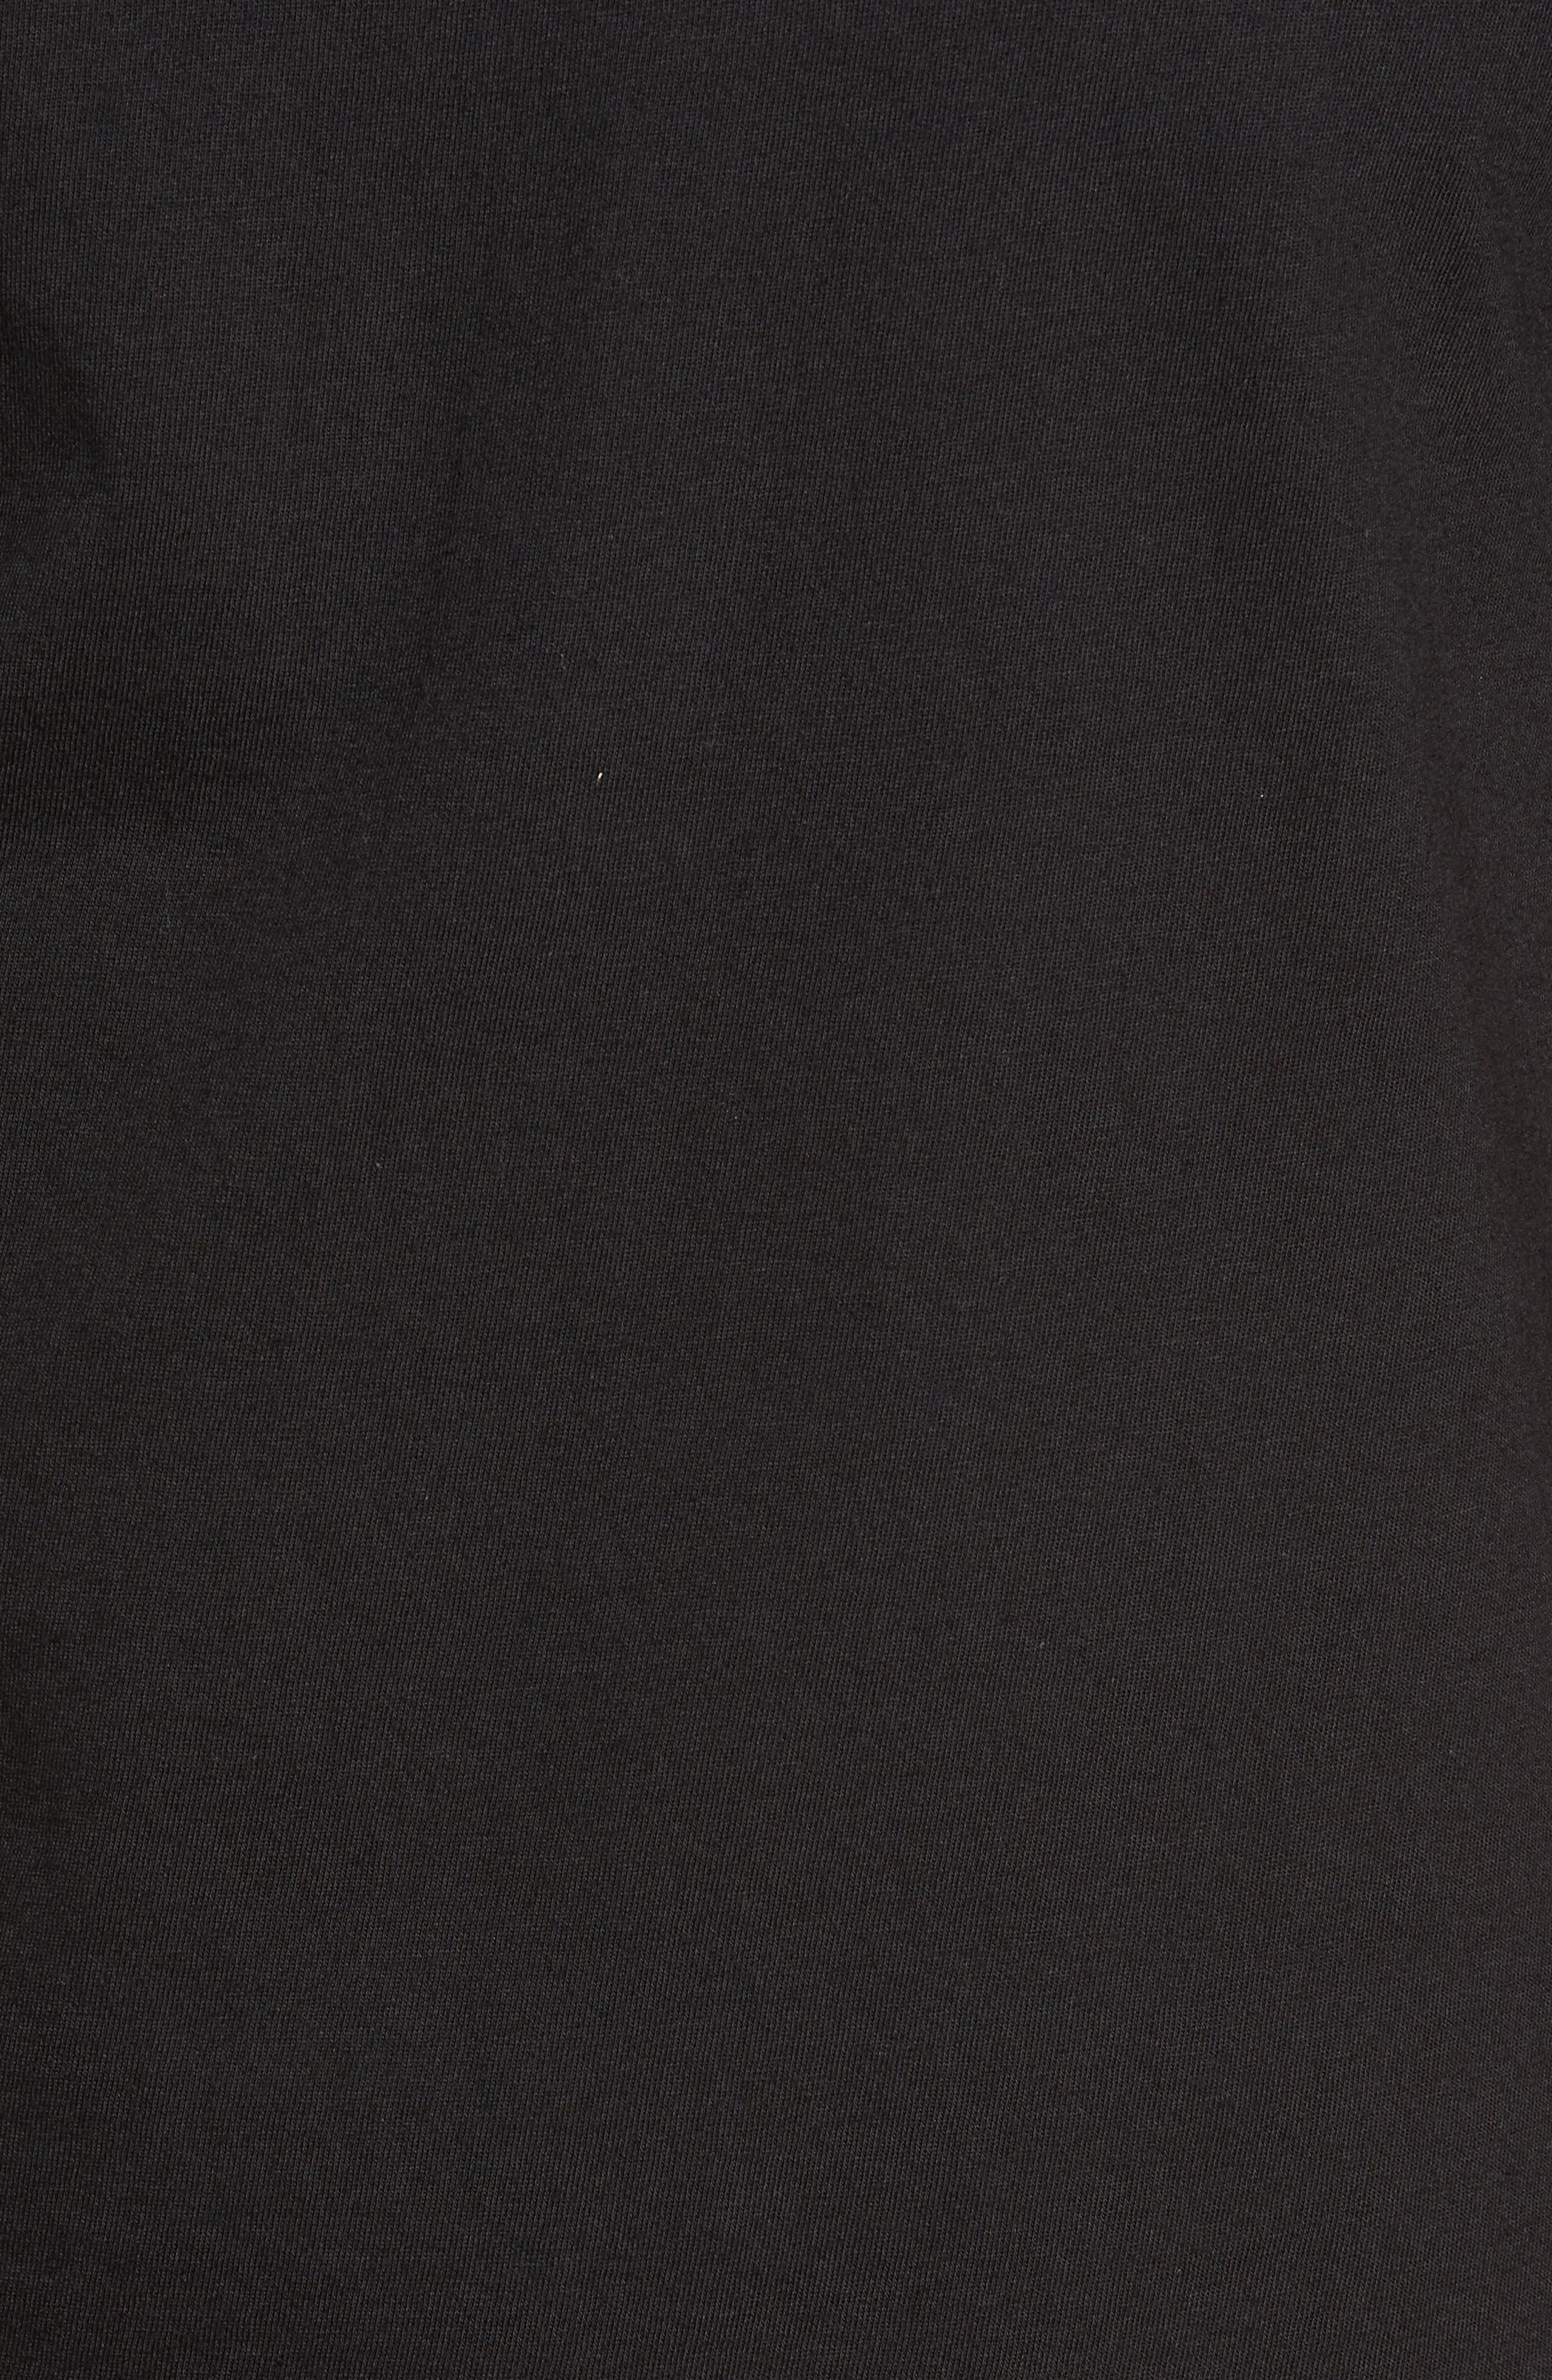 Tuna Roll Graphic T-Shirt,                             Alternate thumbnail 6, color,                             Black